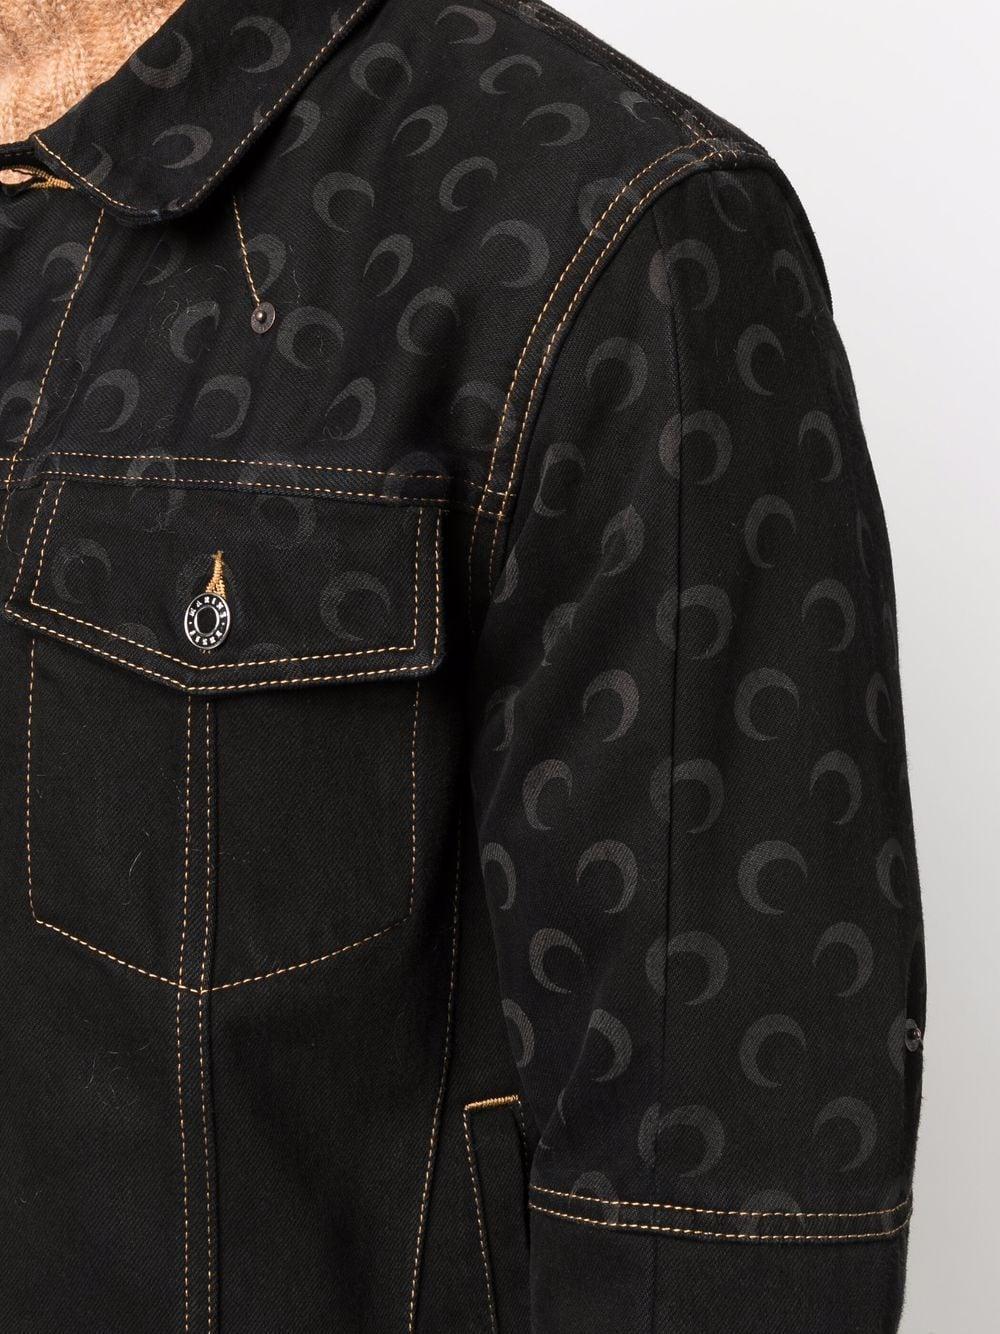 giacca moon denim uomo nera in cotone MARINE SERRE | Giacche | J037FW21MU00